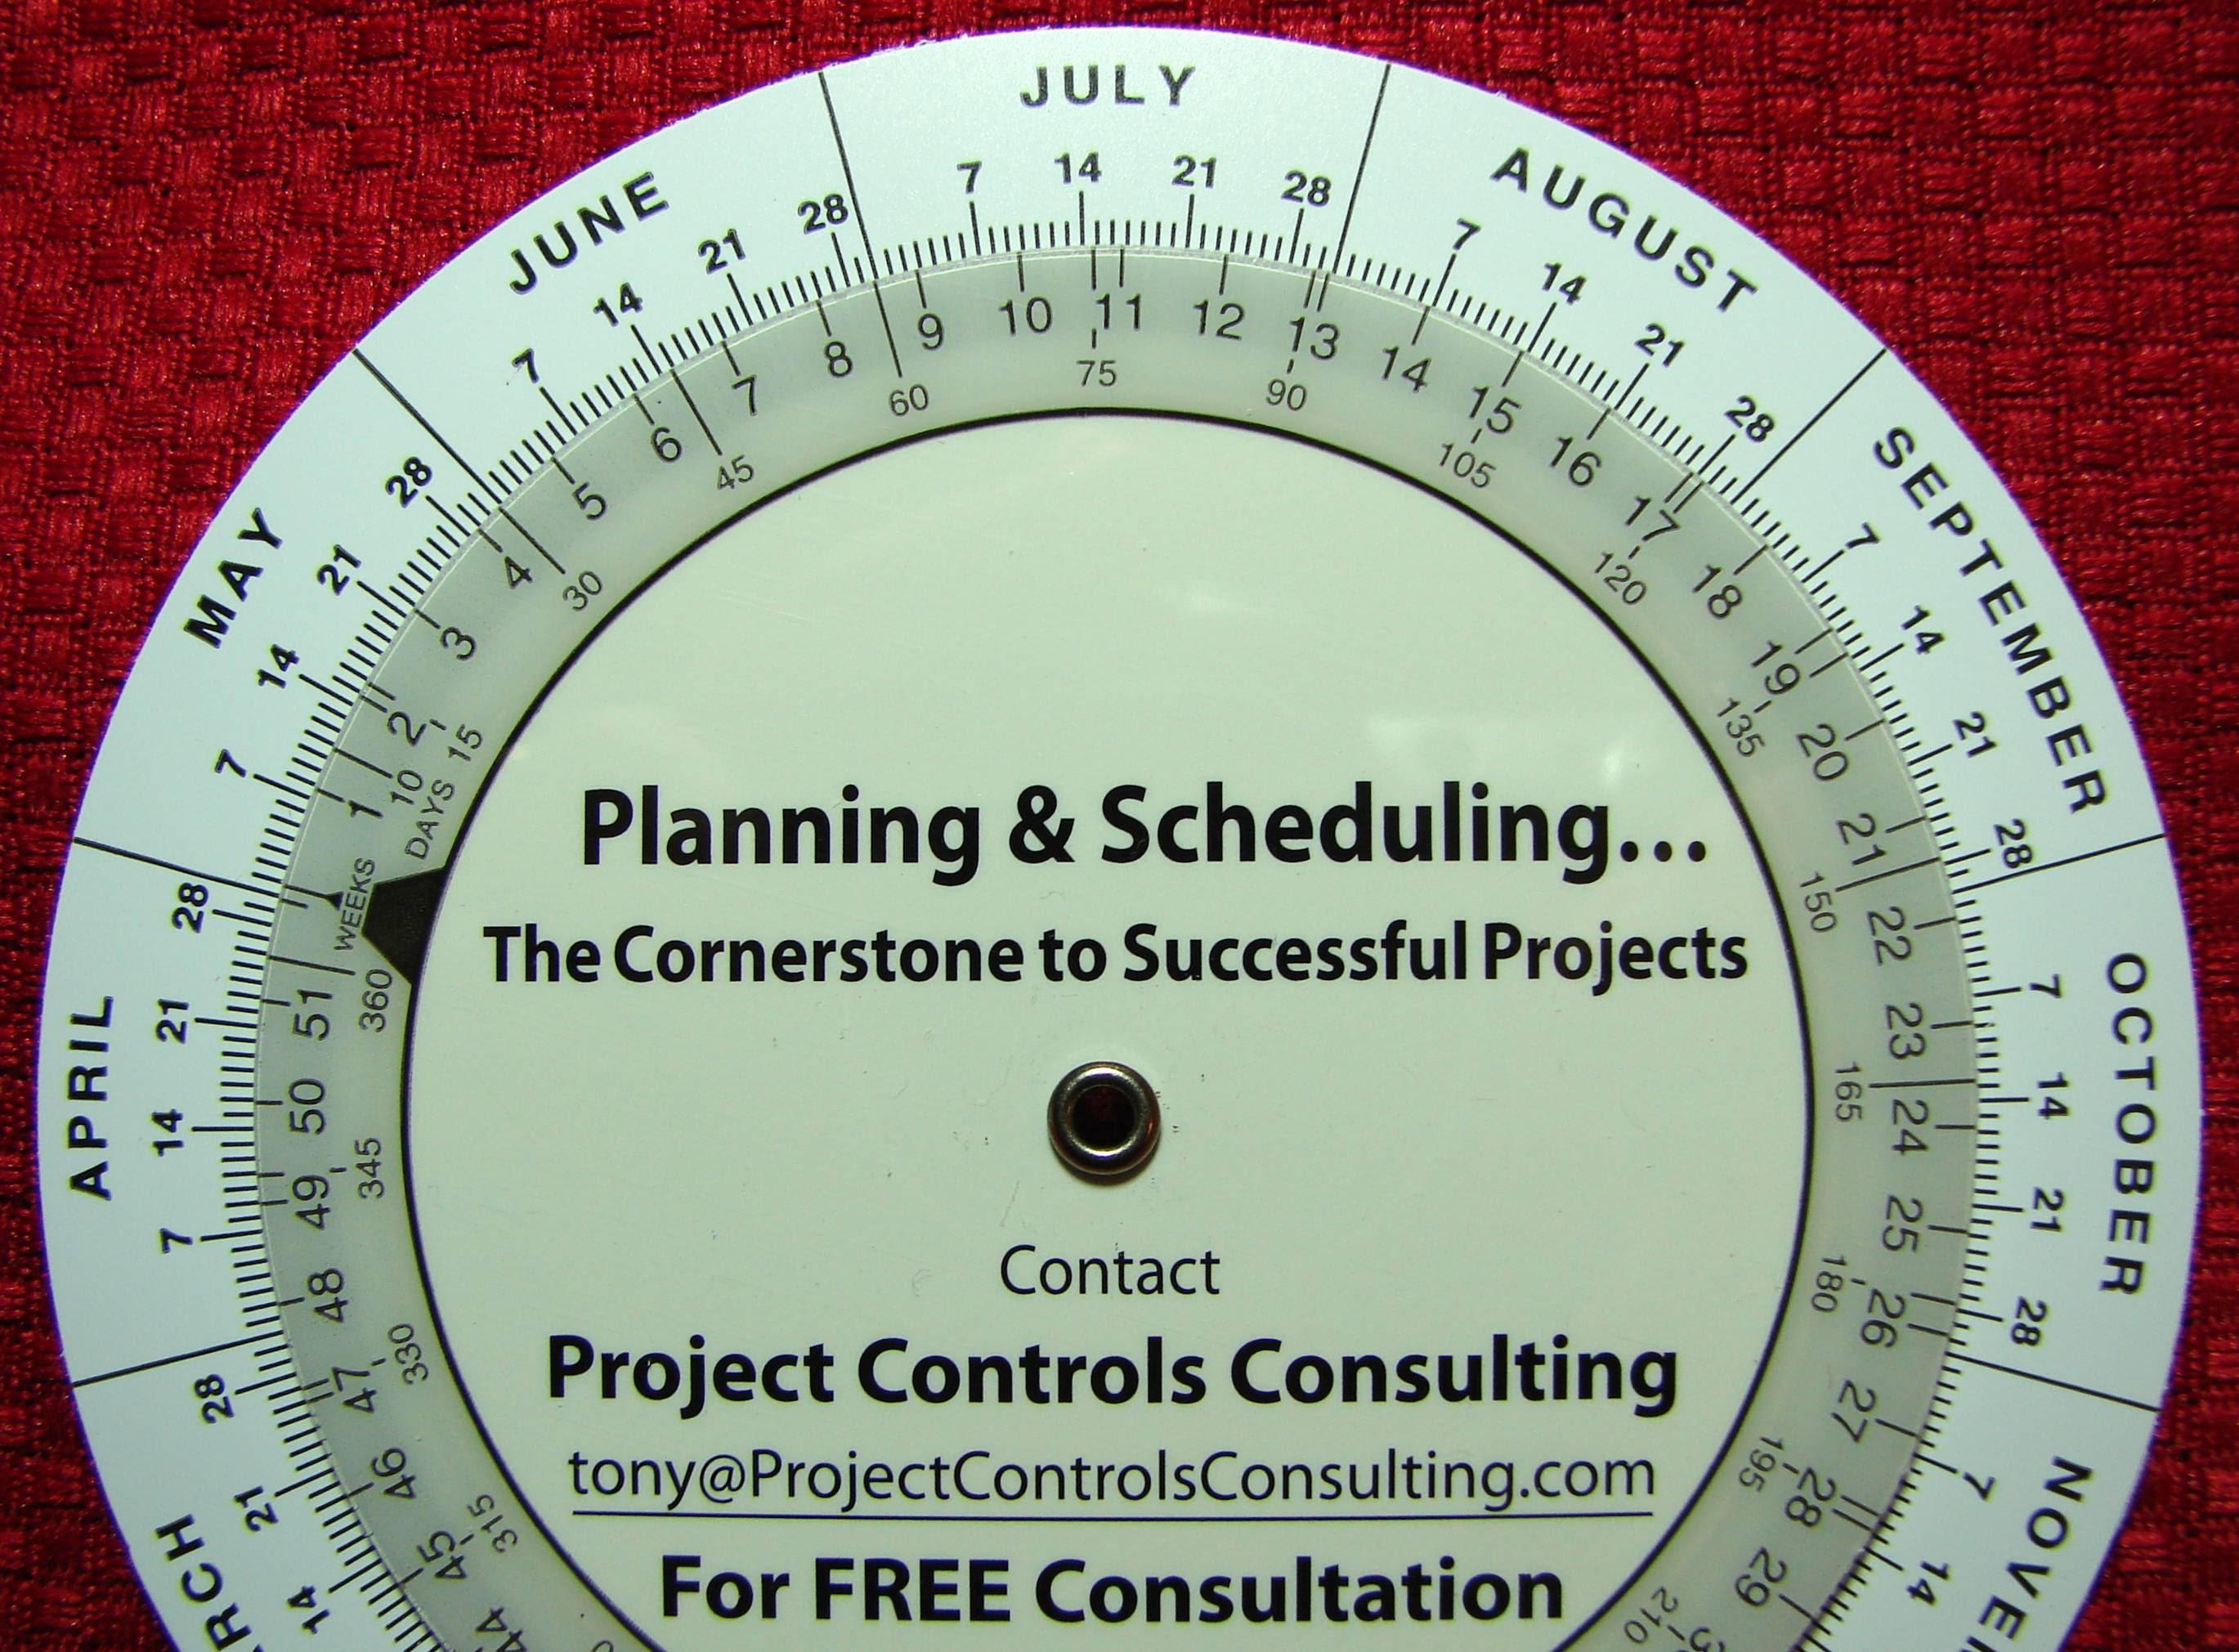 WinCalendar: Excel Calendar Creator with Holidays